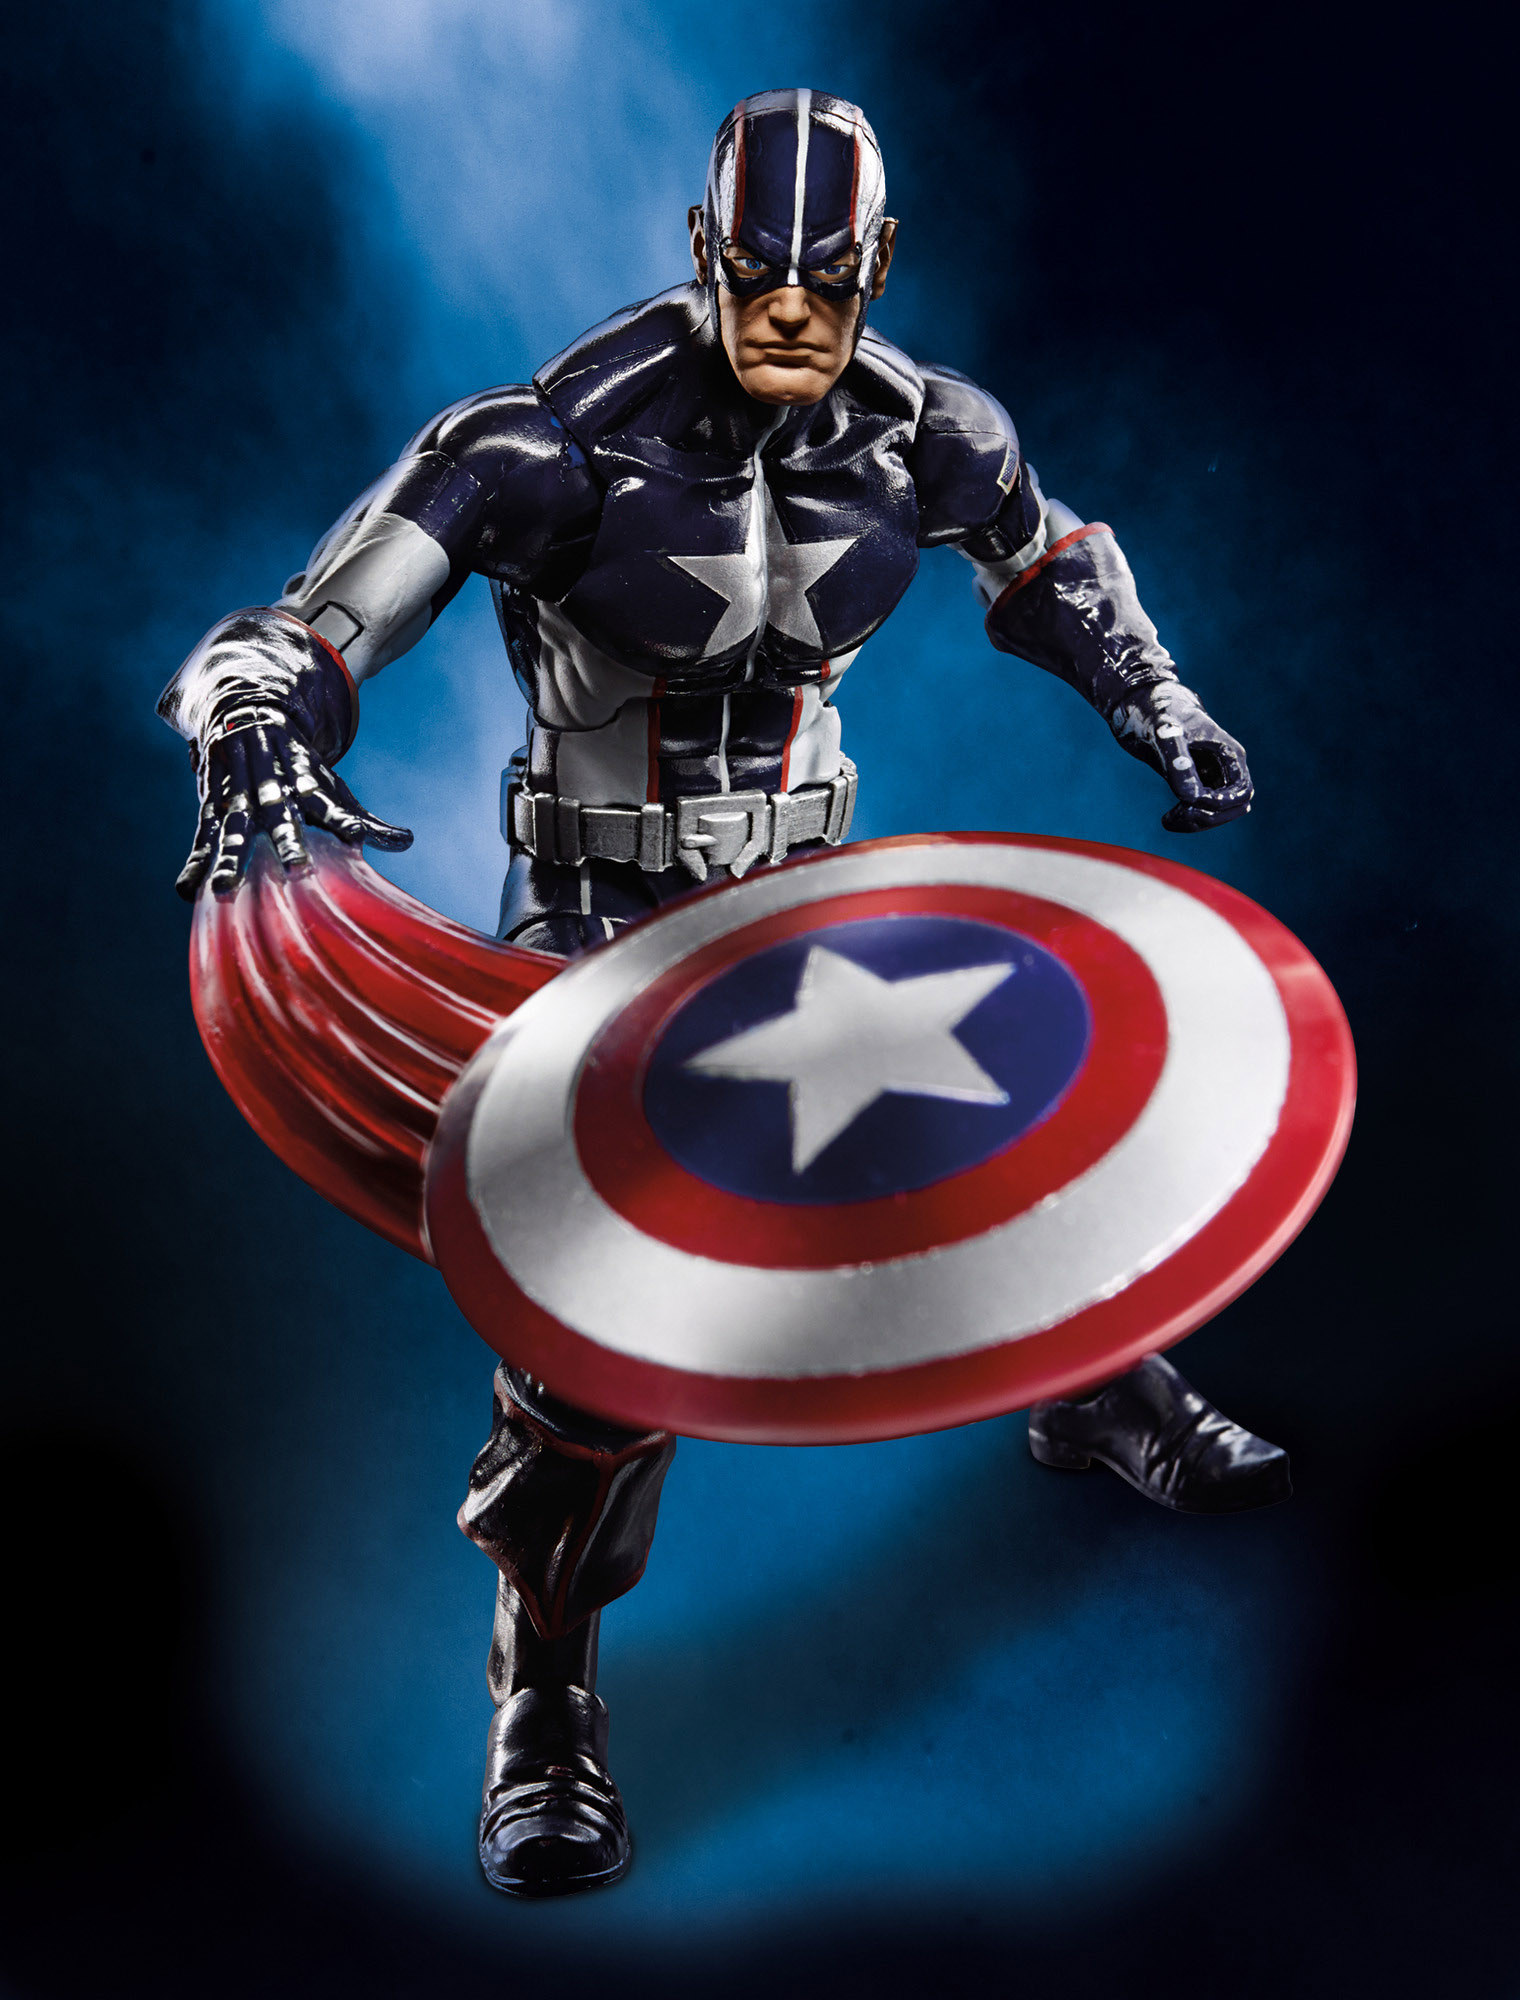 new captain america civil war marvel and x men toys revealed. Black Bedroom Furniture Sets. Home Design Ideas